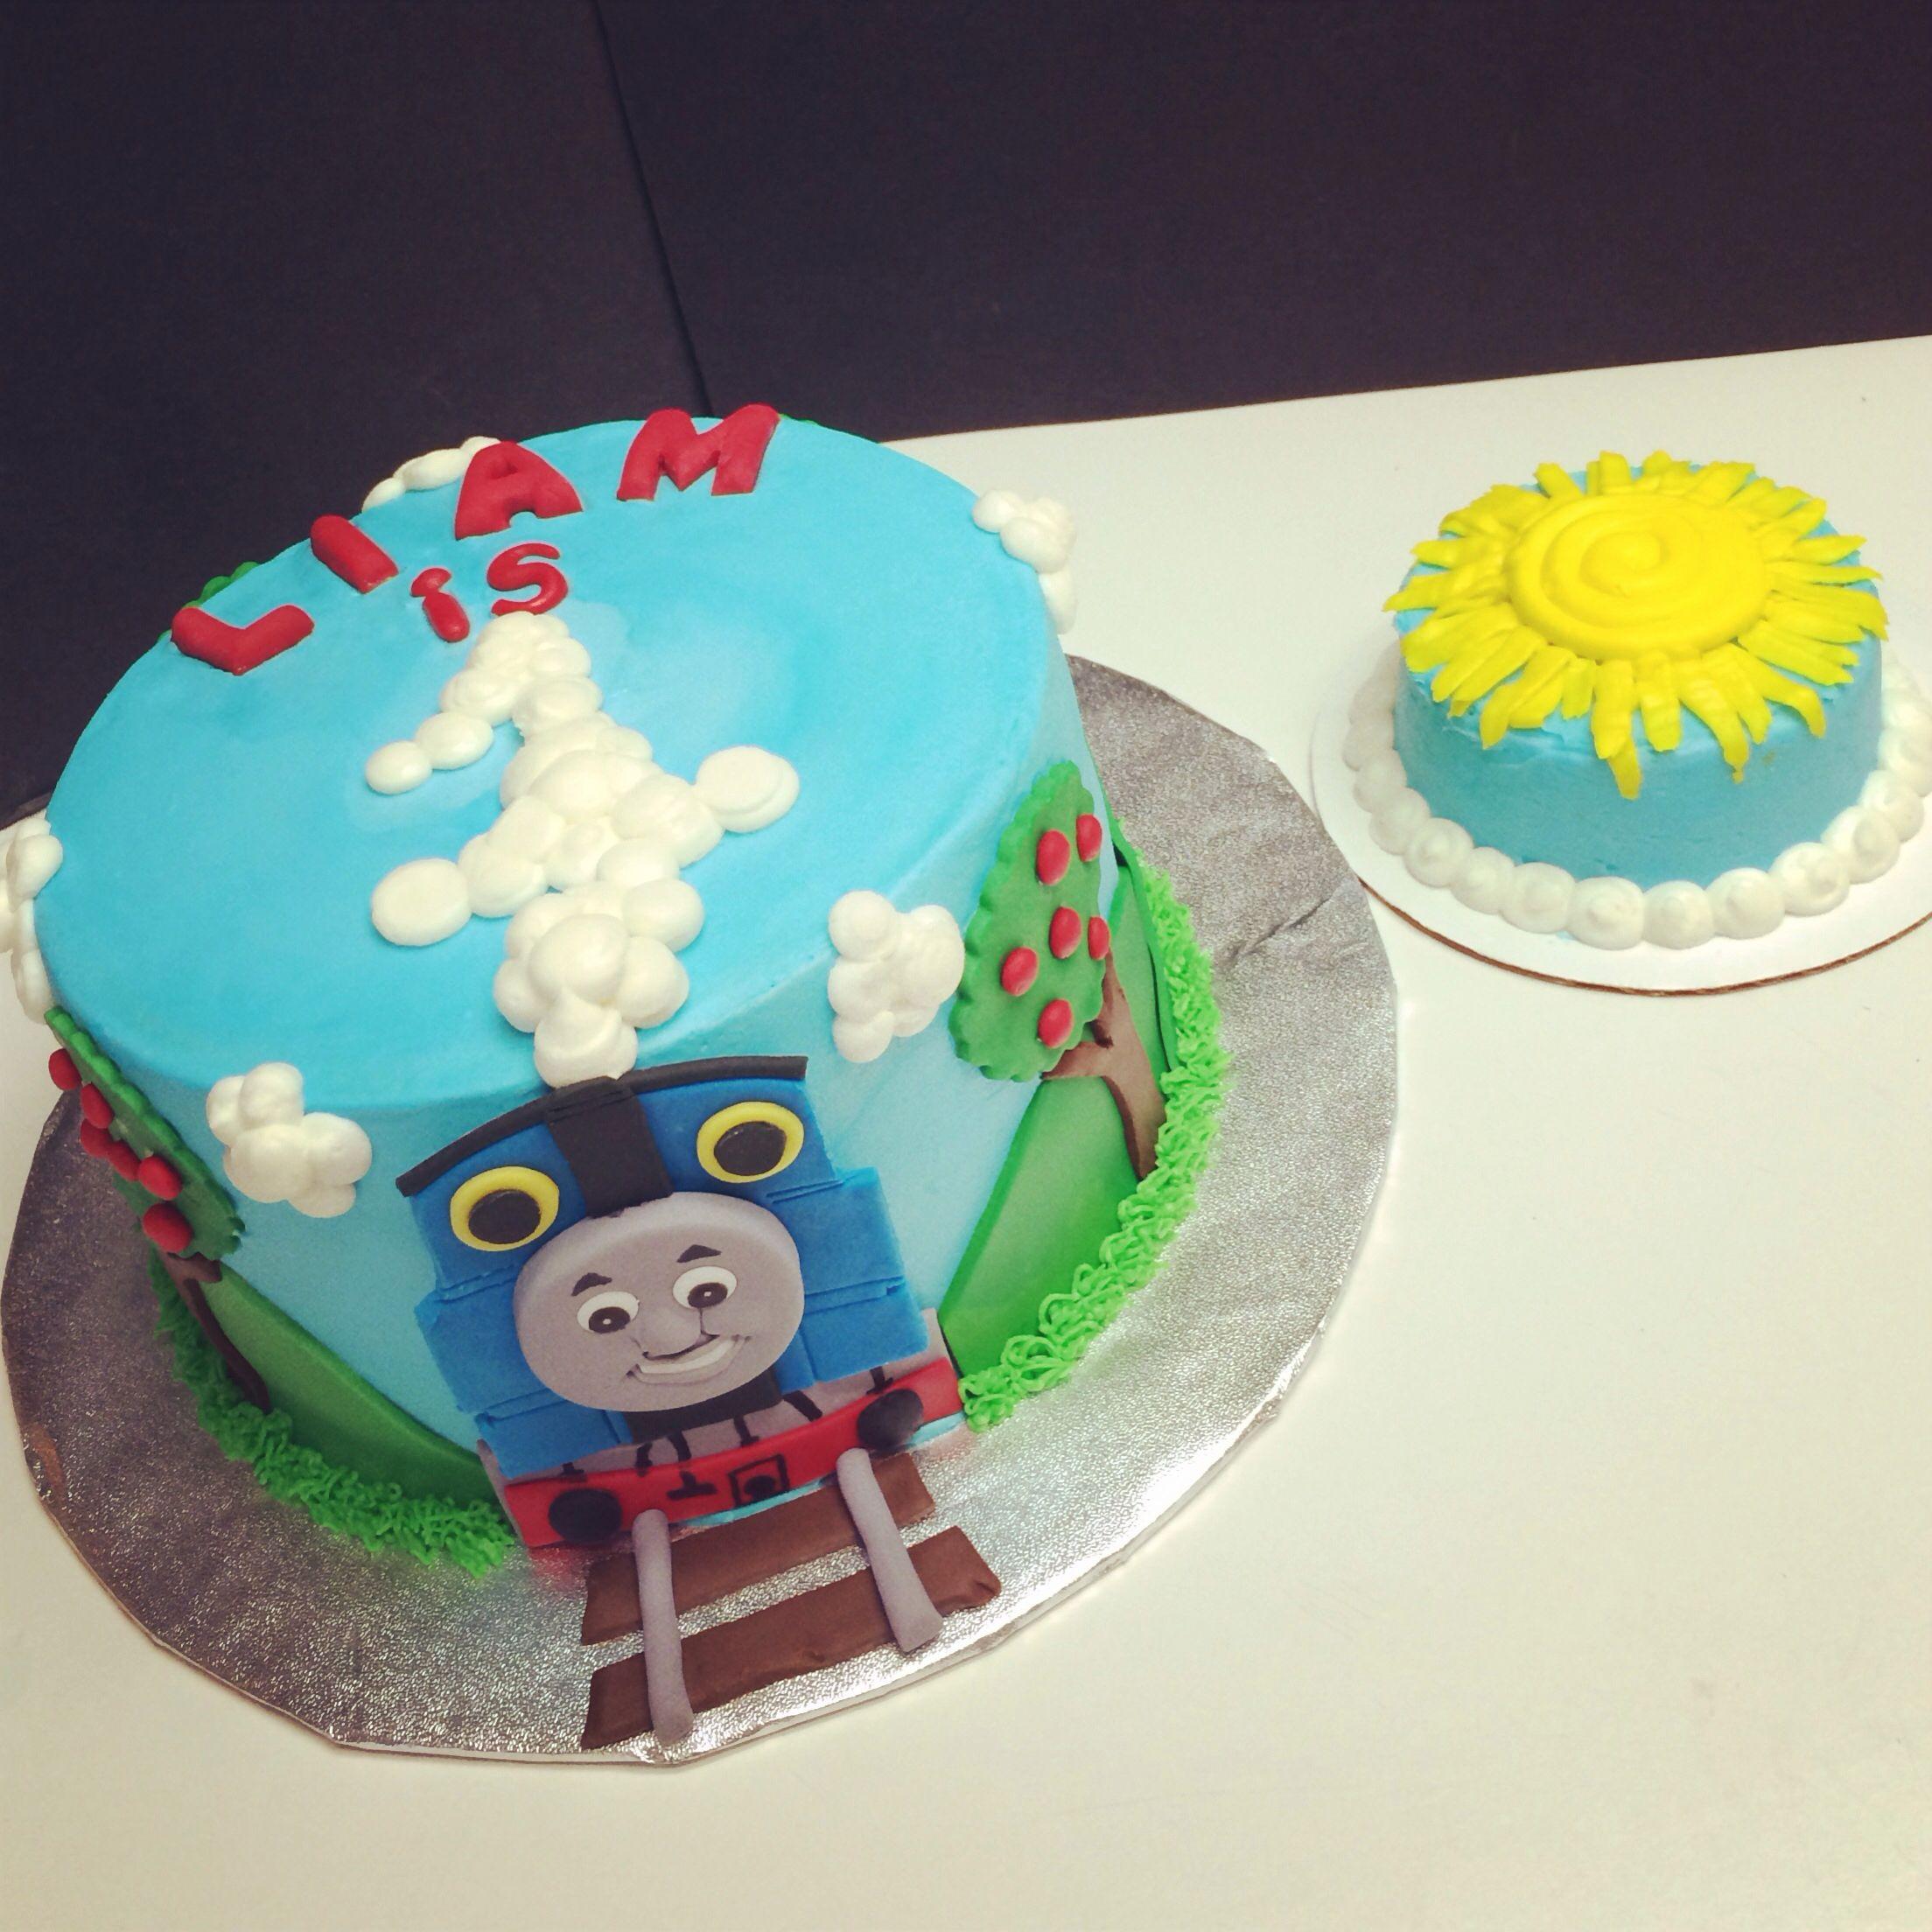 Thomas The Train Cake With Smash Cake